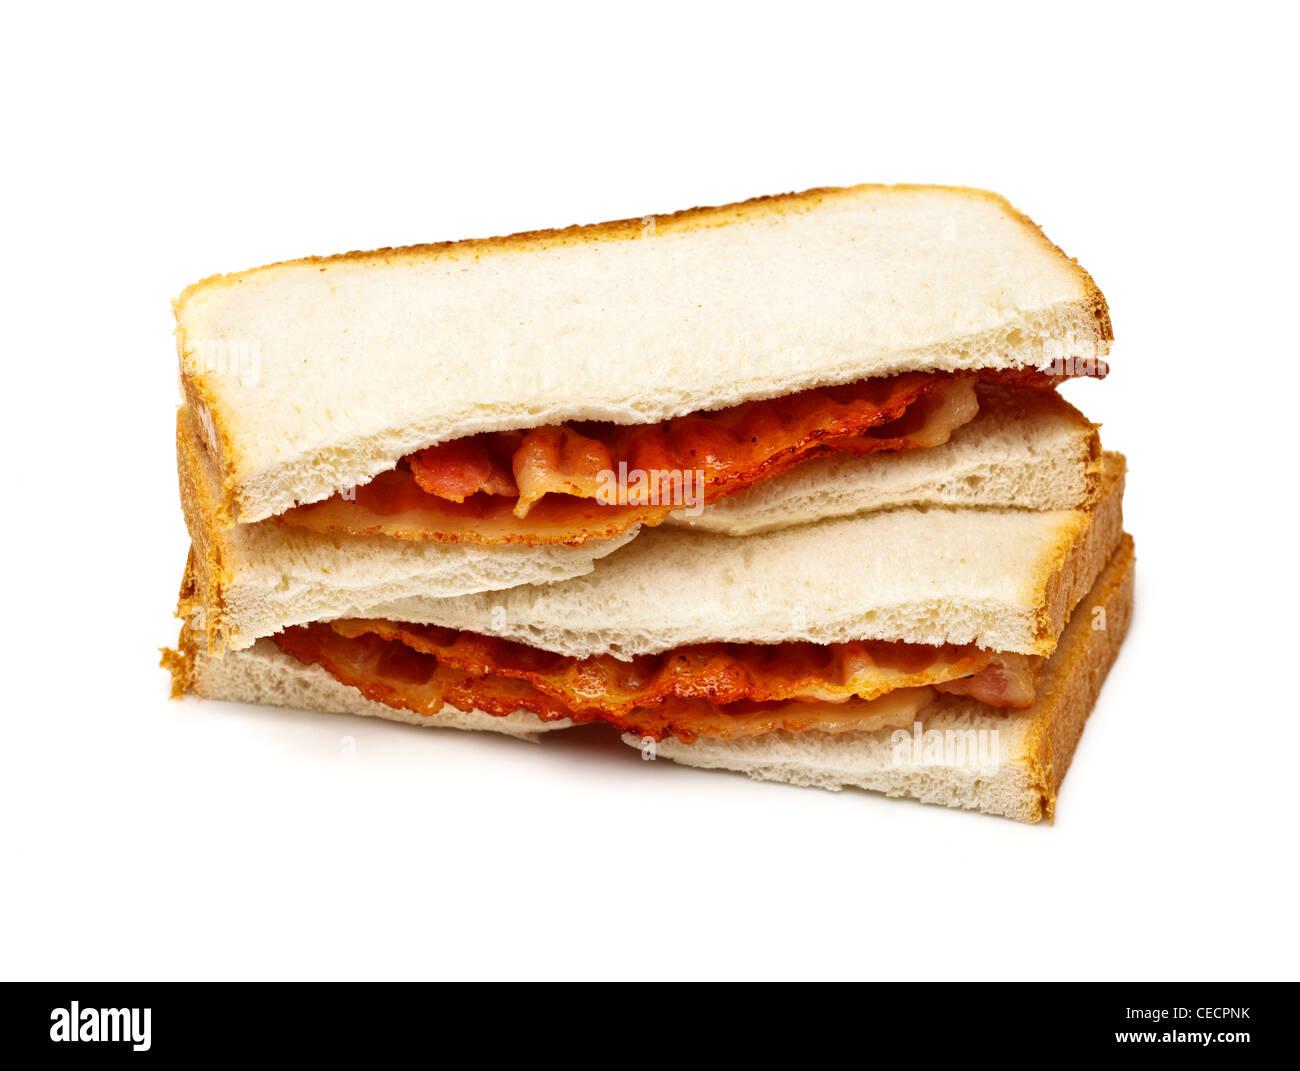 Bacon sandwich on white background - Stock Image